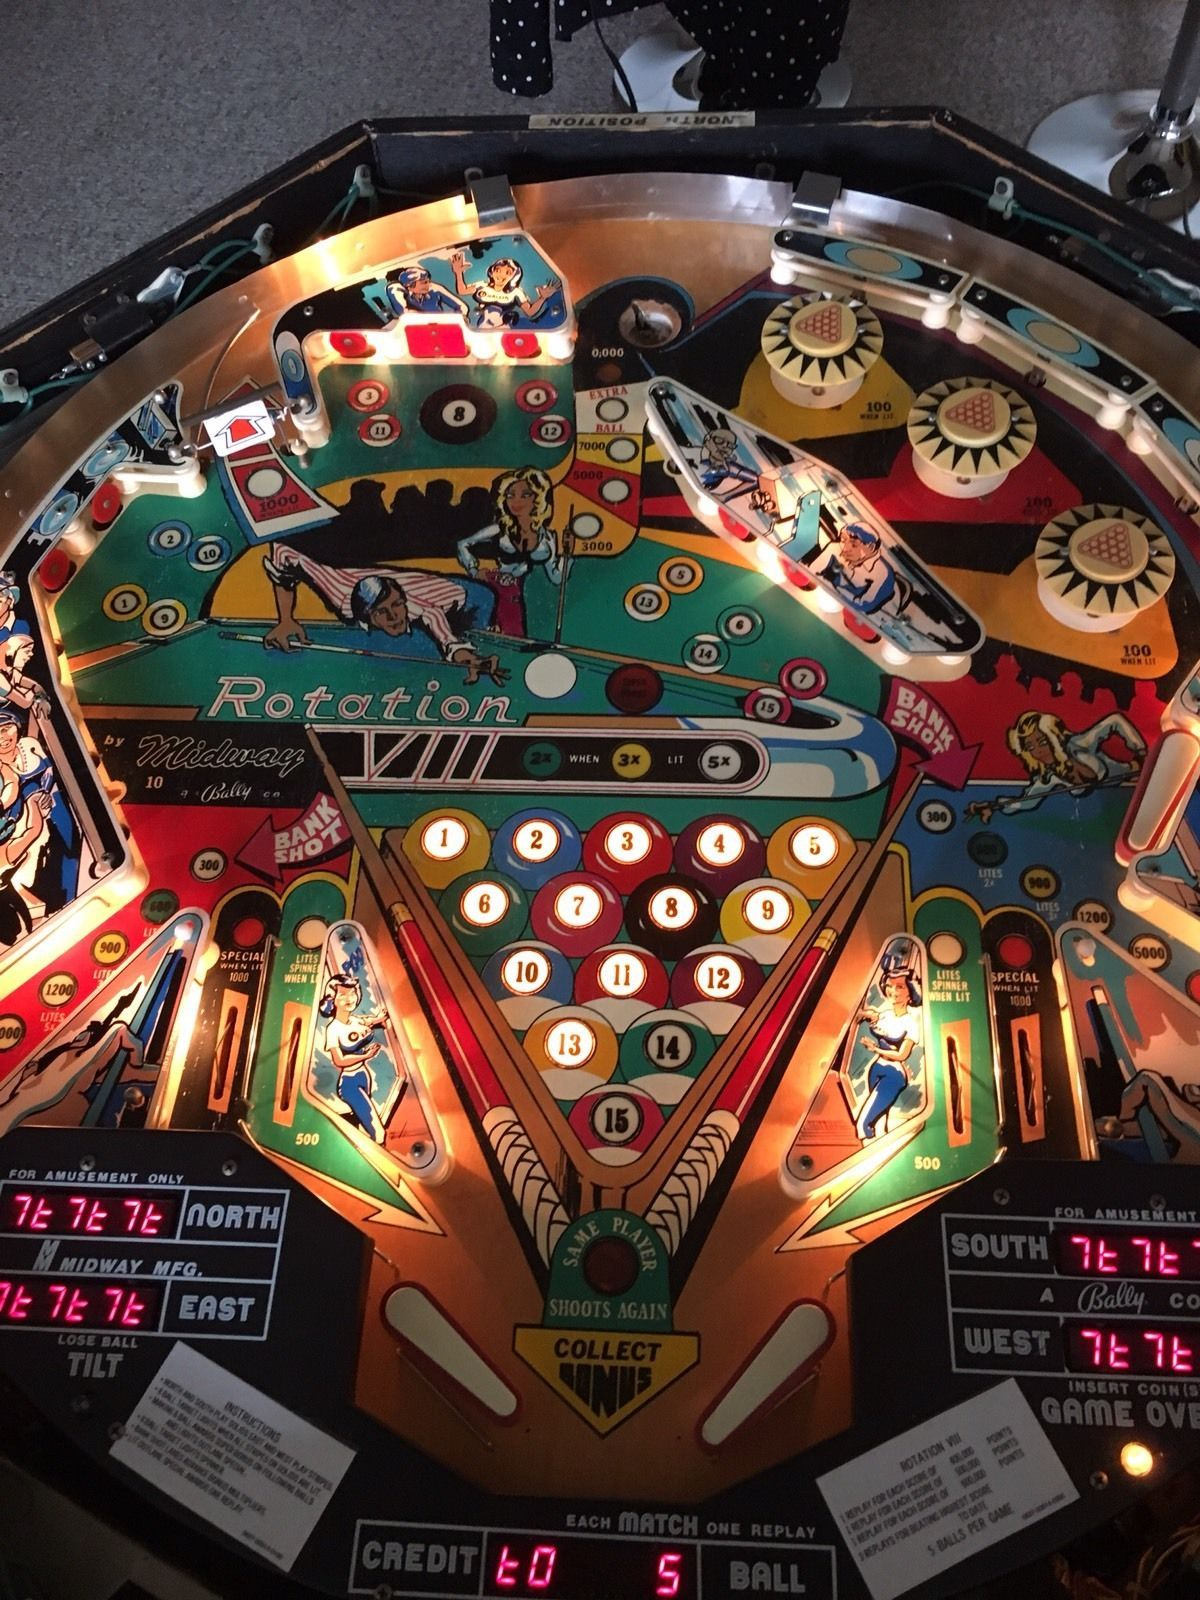 1978 midways rotationvlll pinball machine vintage games